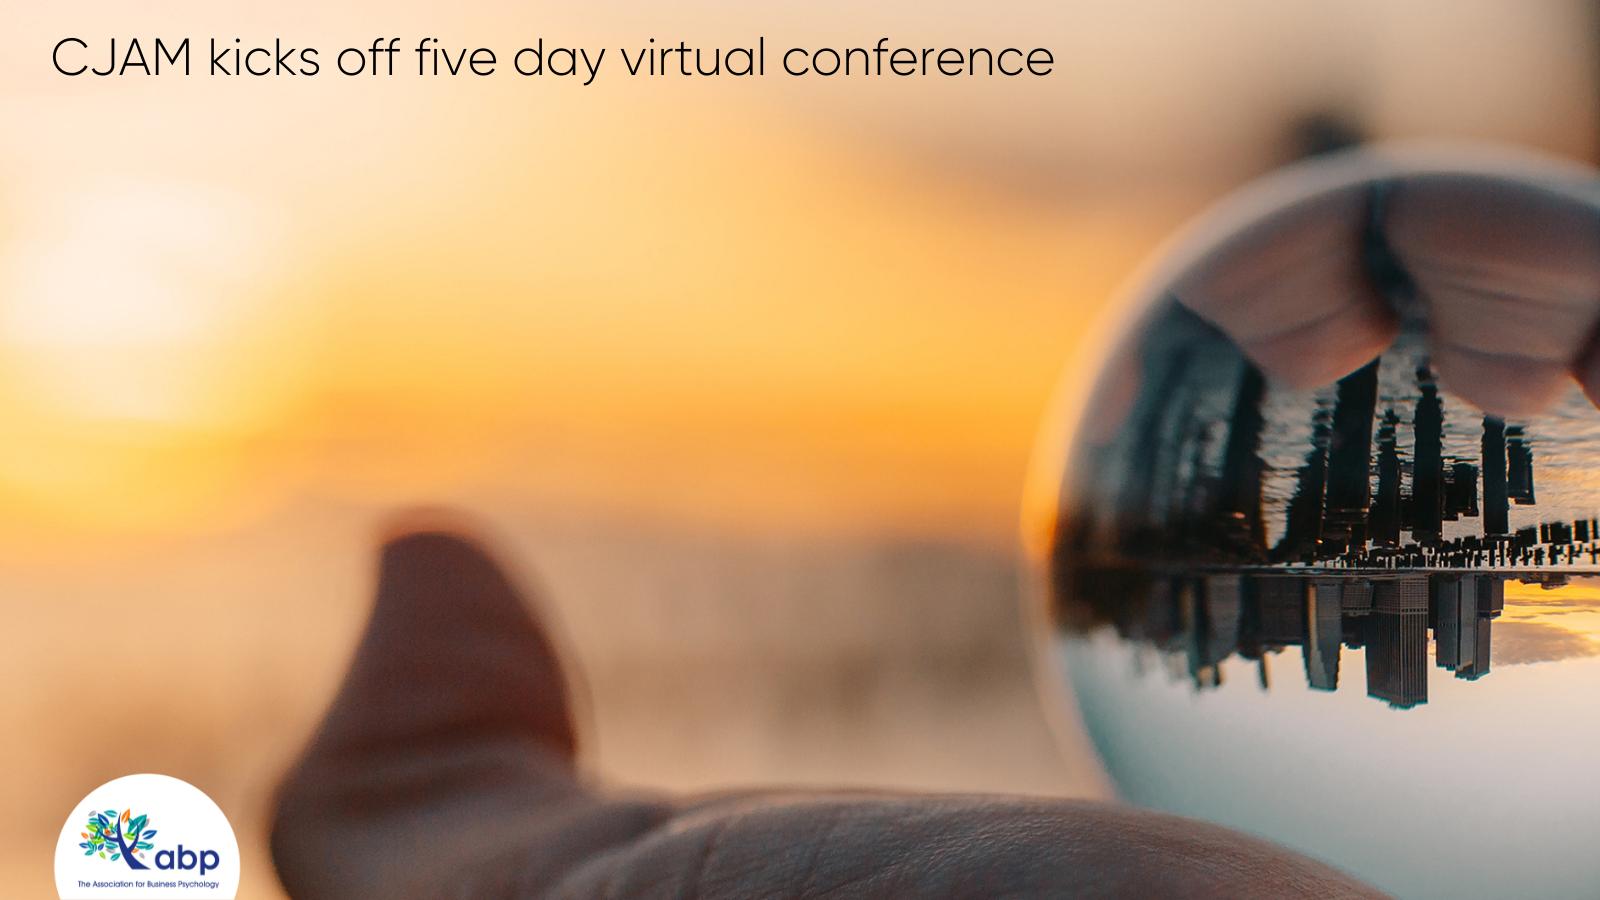 CJAM Kicks Of Five Day Virtual Conference